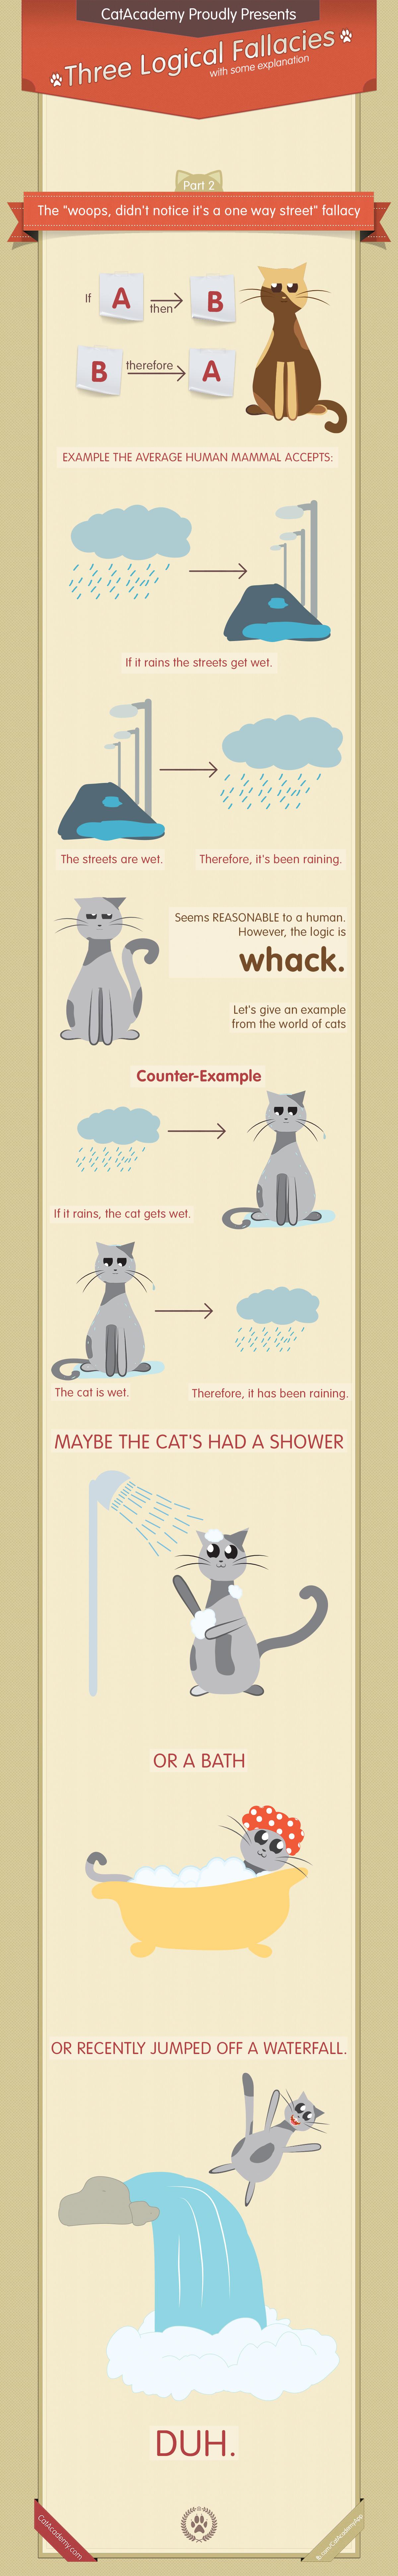 Three Logical Fallacies Infographic Logical Fallacies